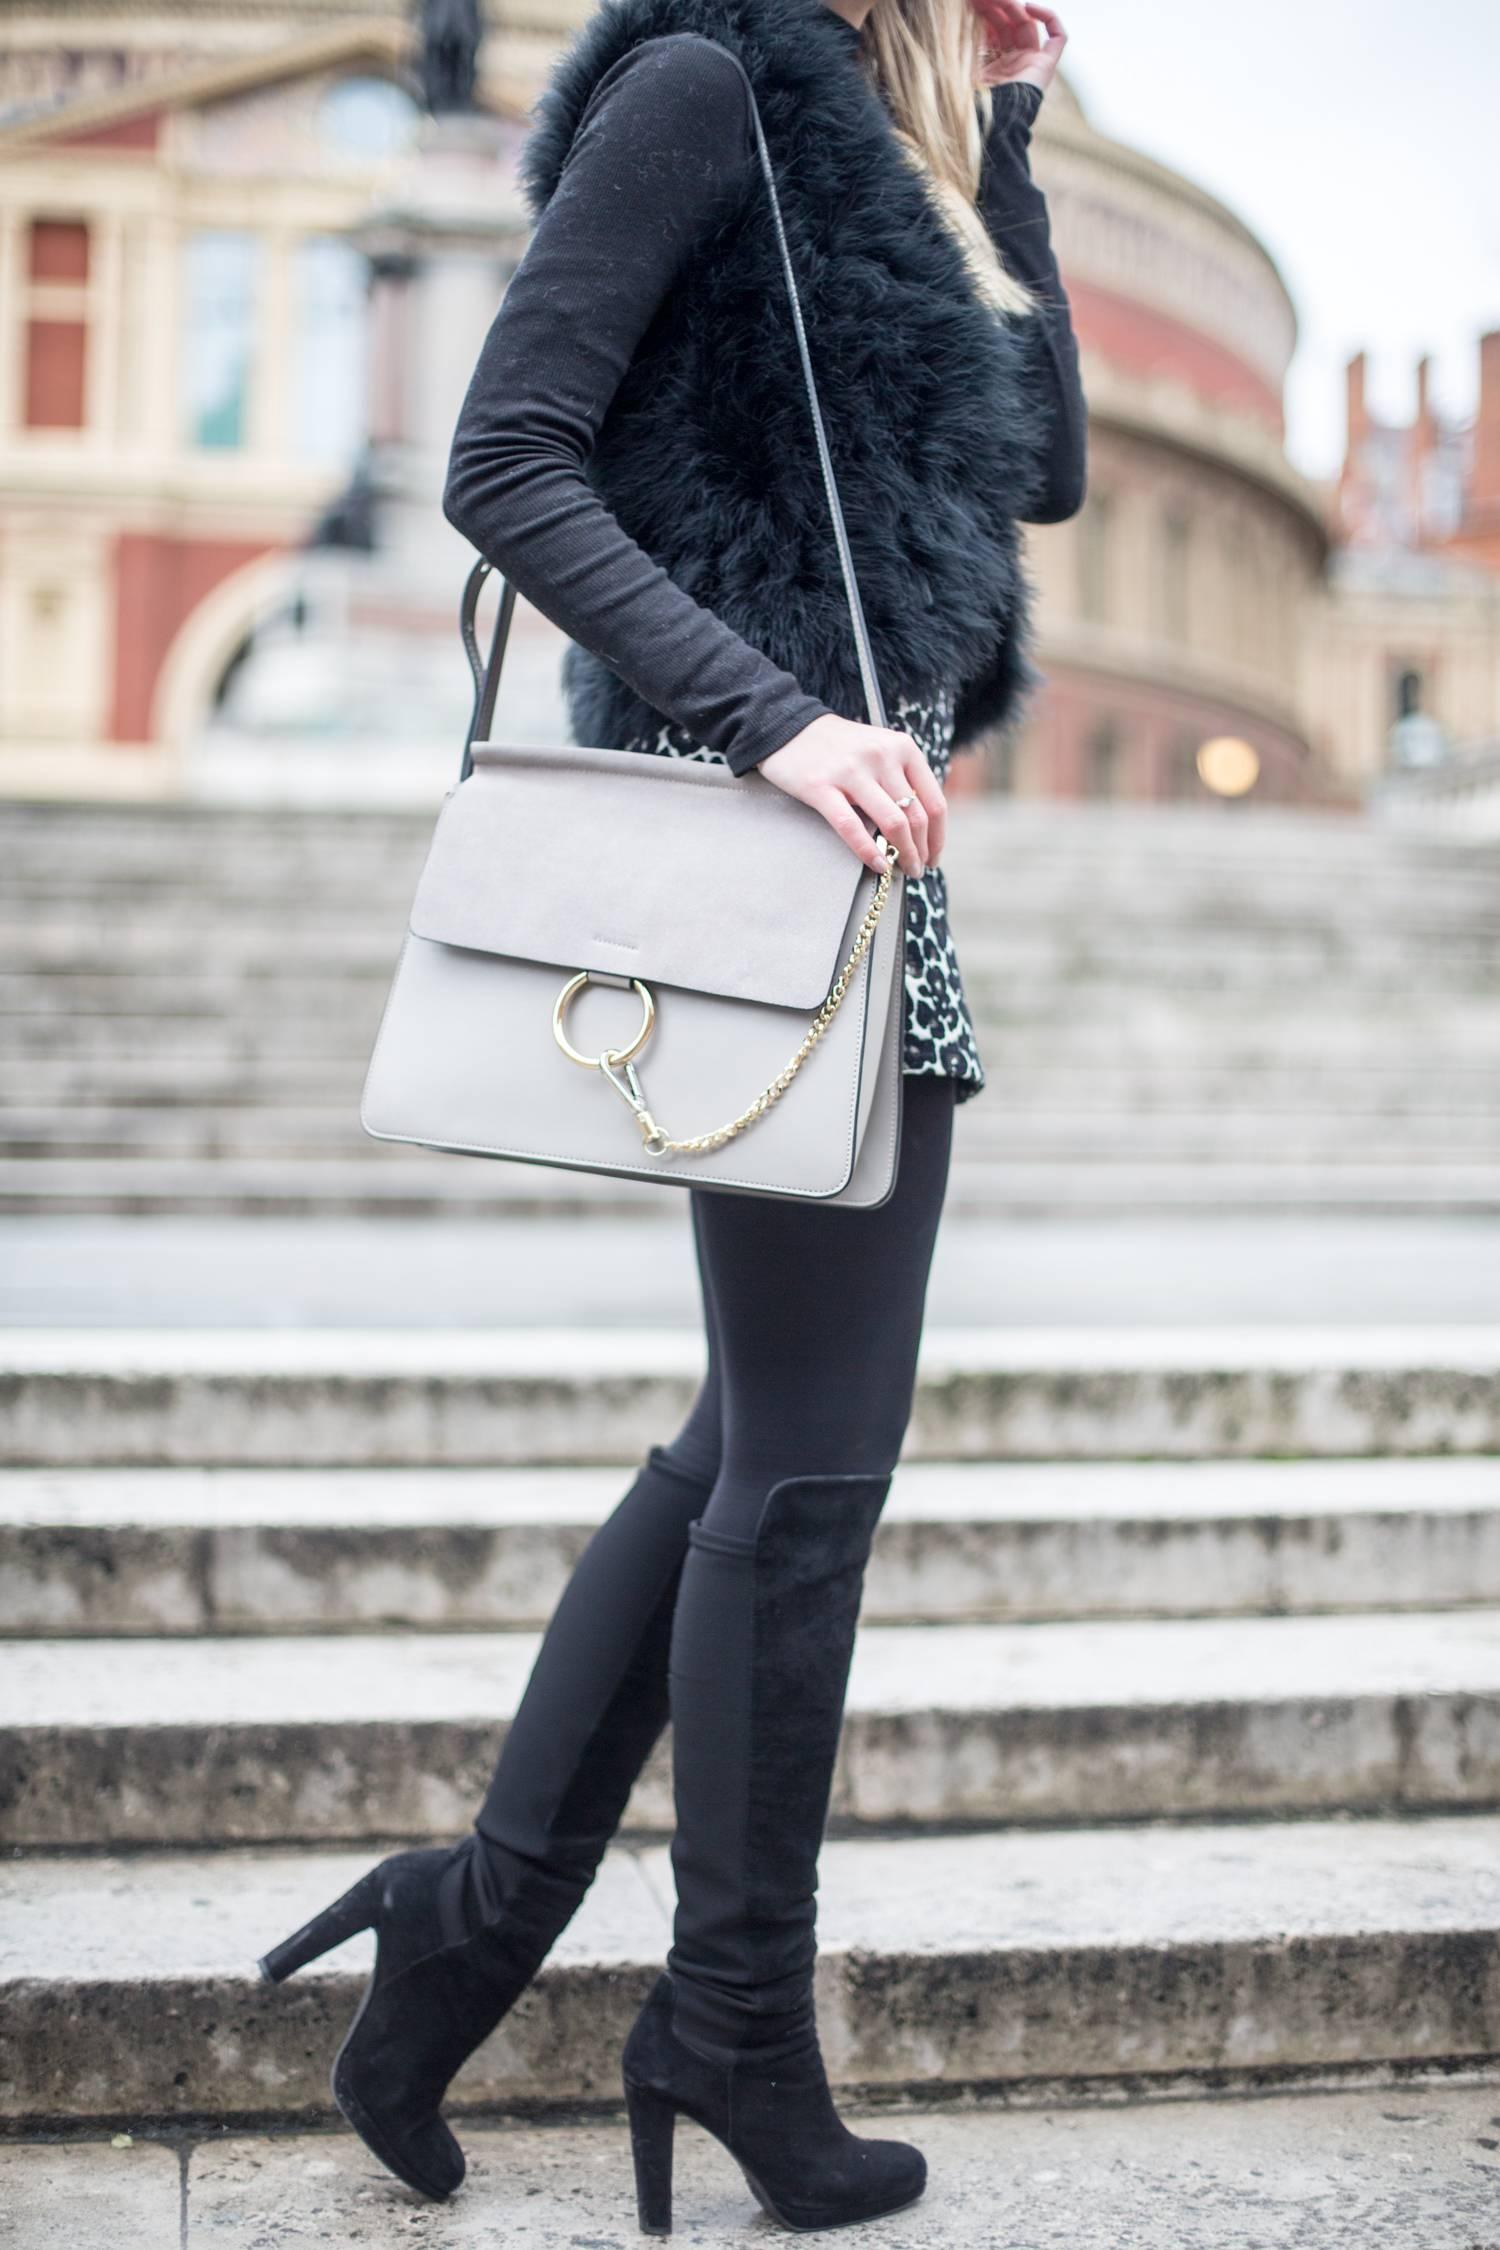 38f9c3c6 Handbags : Dupes Vs Investments! - Fashion Mumblr